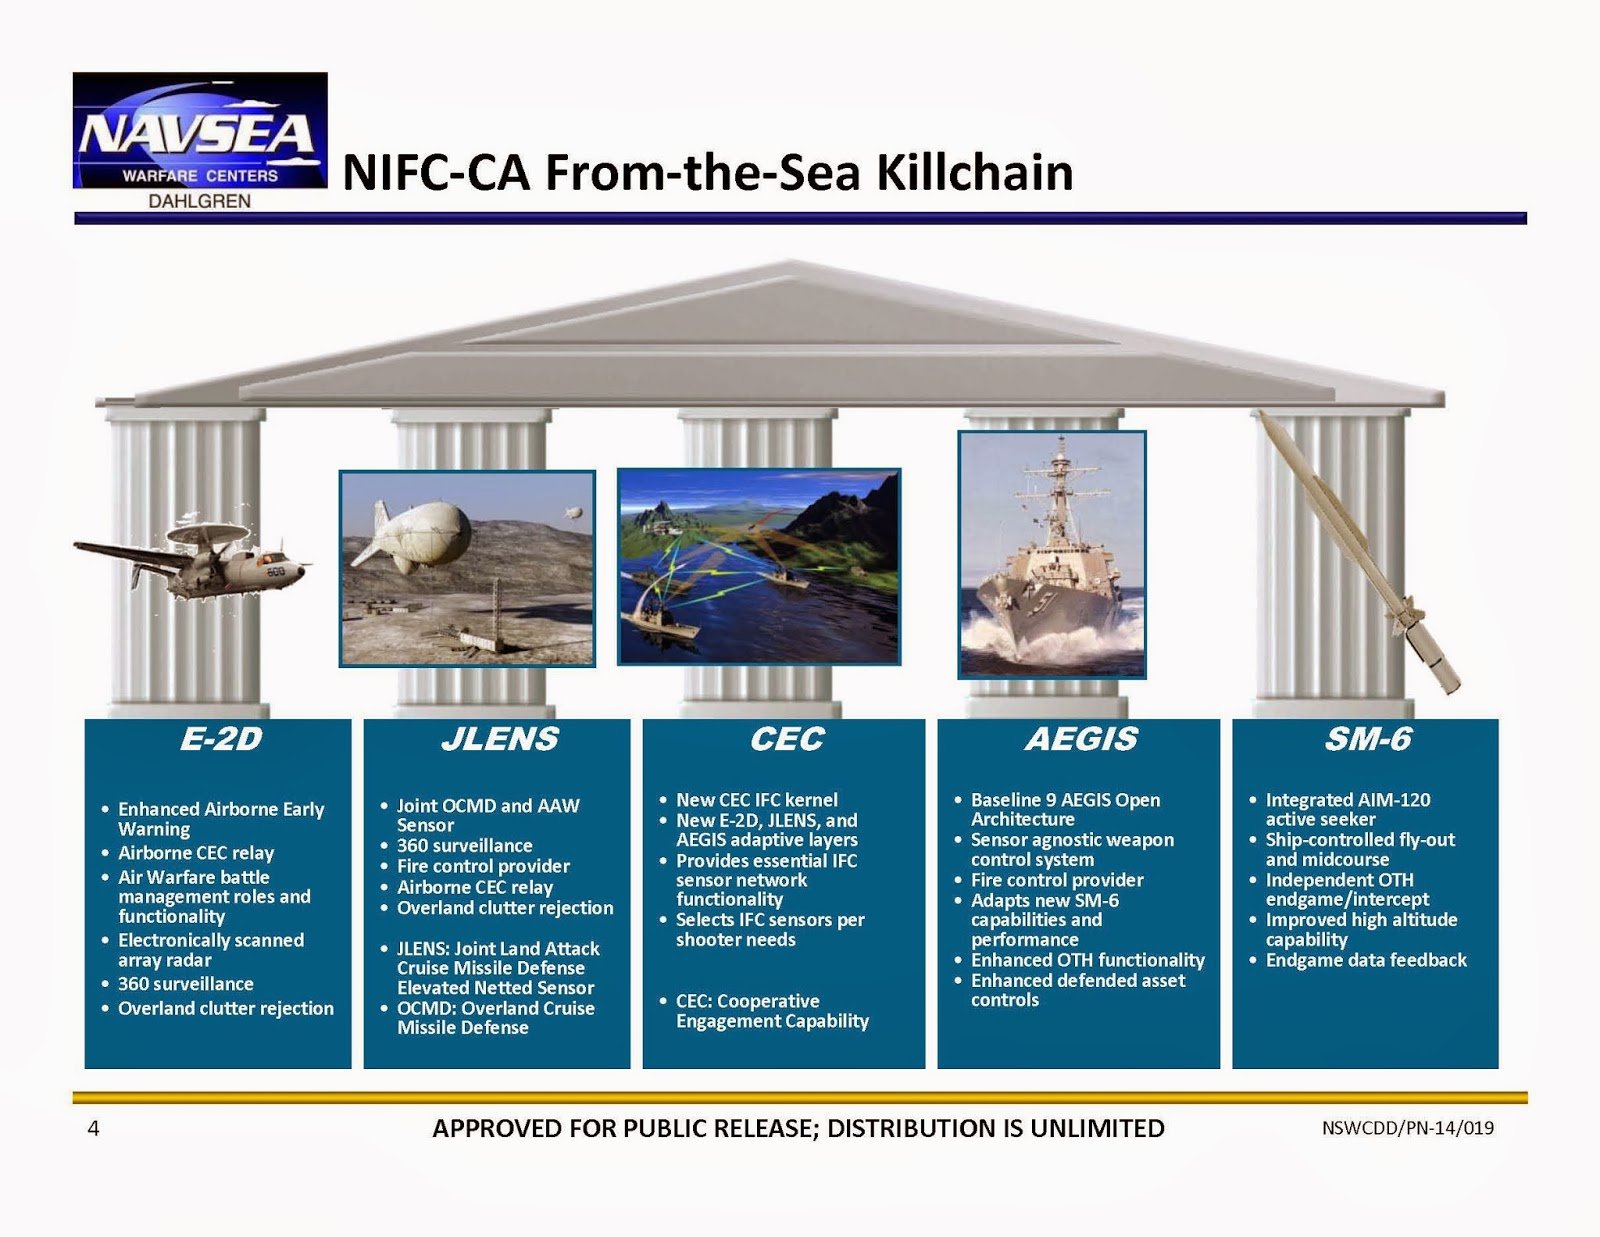 Интеграция ПВО/ПРО американских Армии и флота